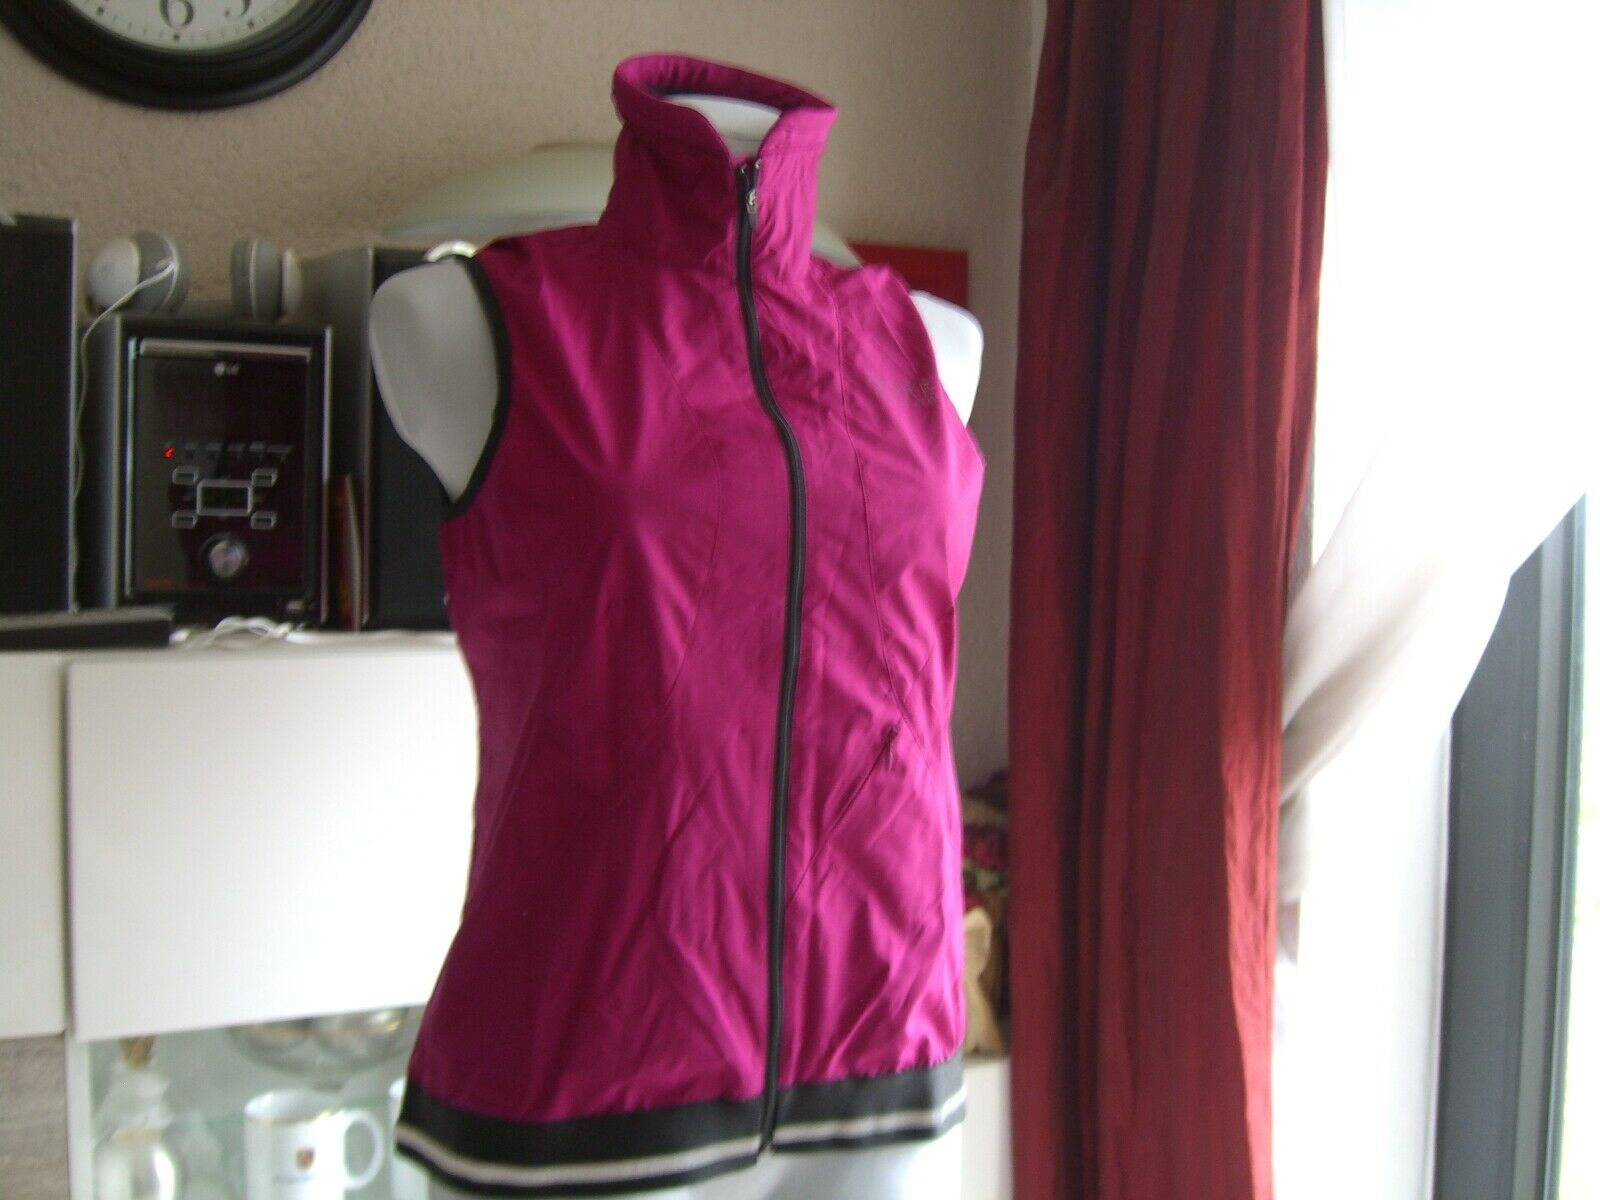 Gore NEU L Gr.40 pink Laufweste Weste Damen AS 2.0 Air Wear